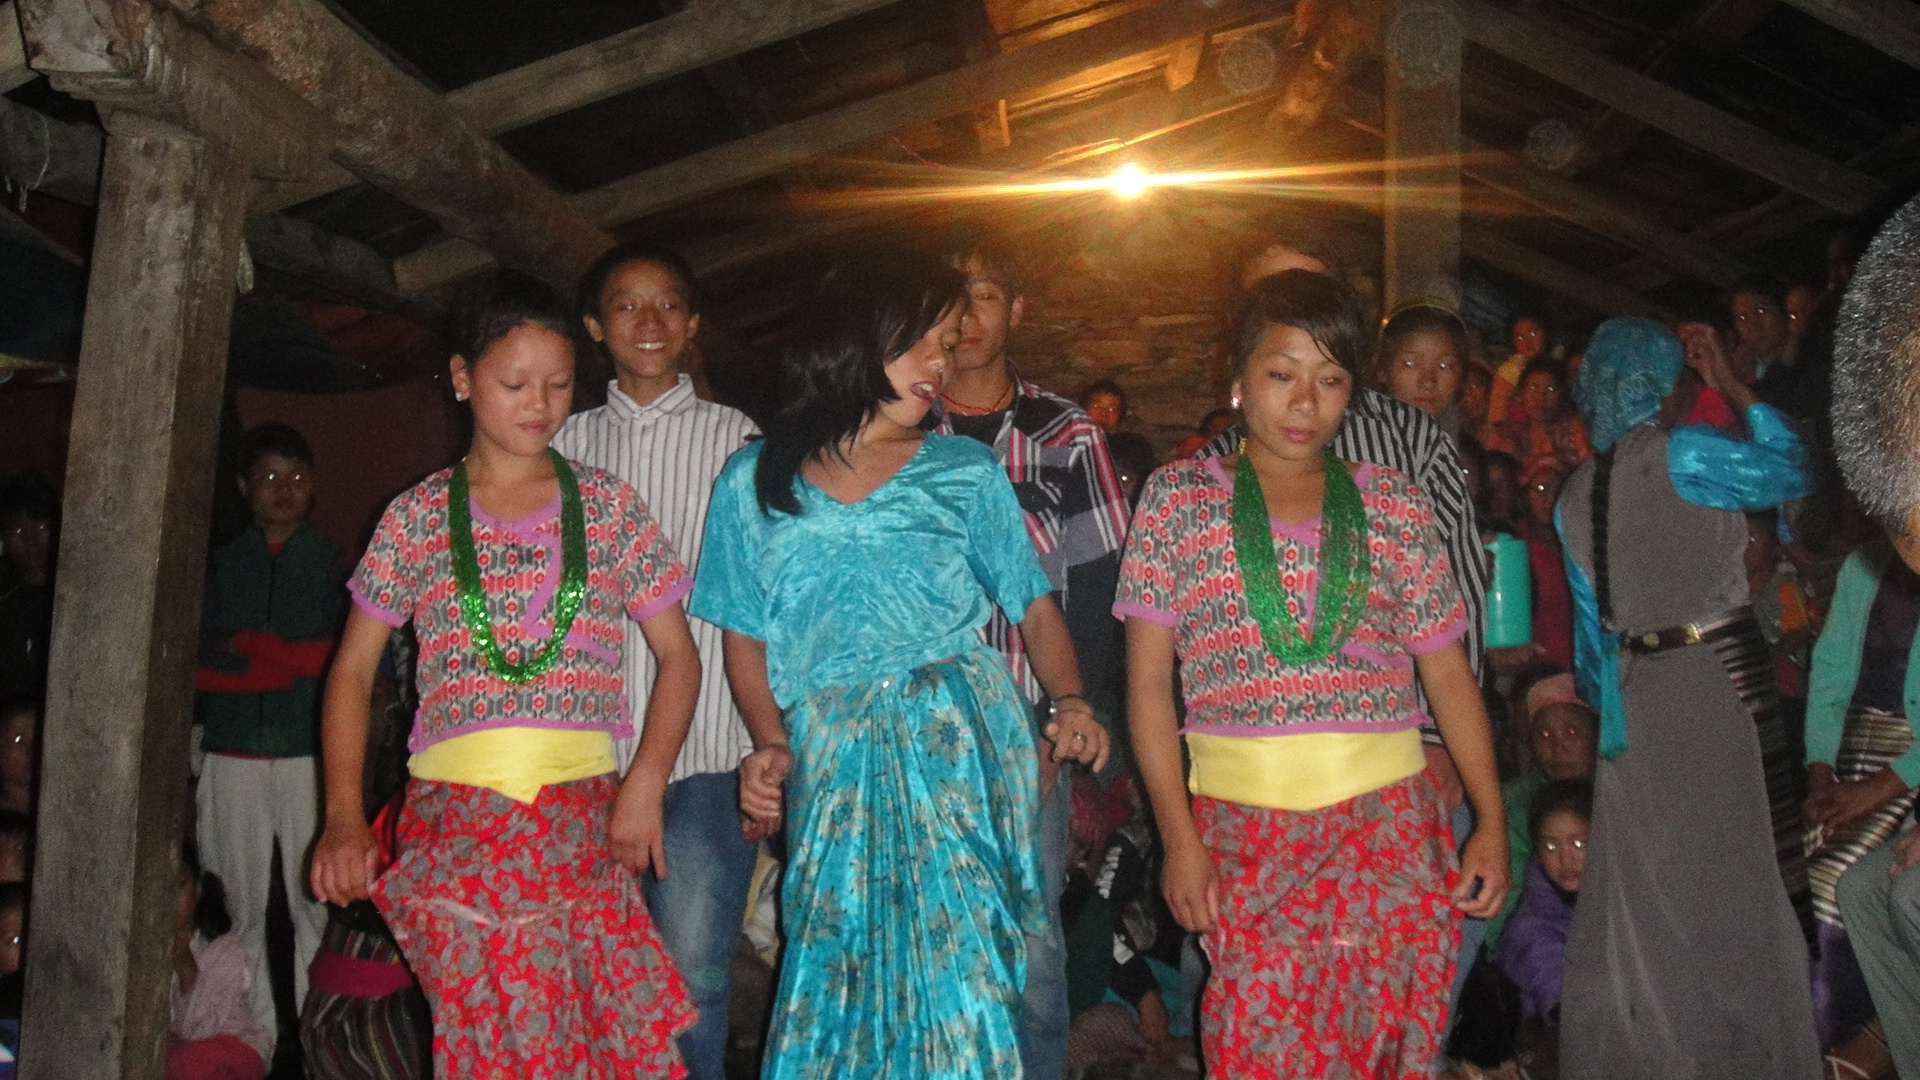 Nepali_Women_Dancing_Adventure_Alternative_Nepal.JPG